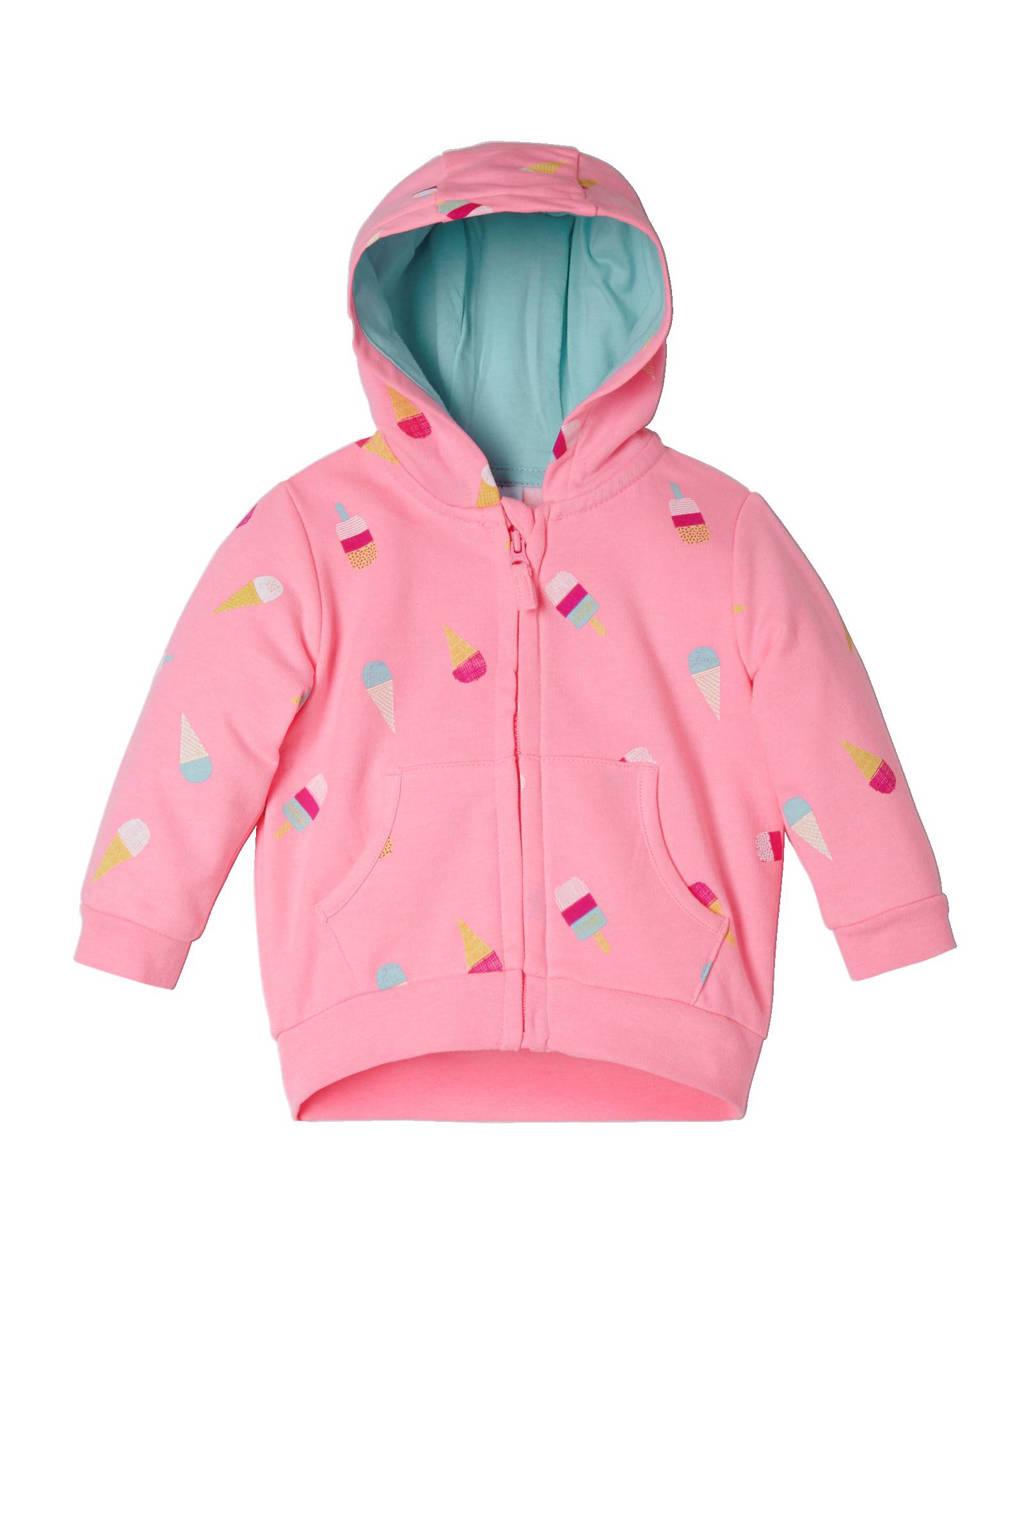 C&A Baby Club sweatvest met capuchon, Roze/lichtblauw/geel